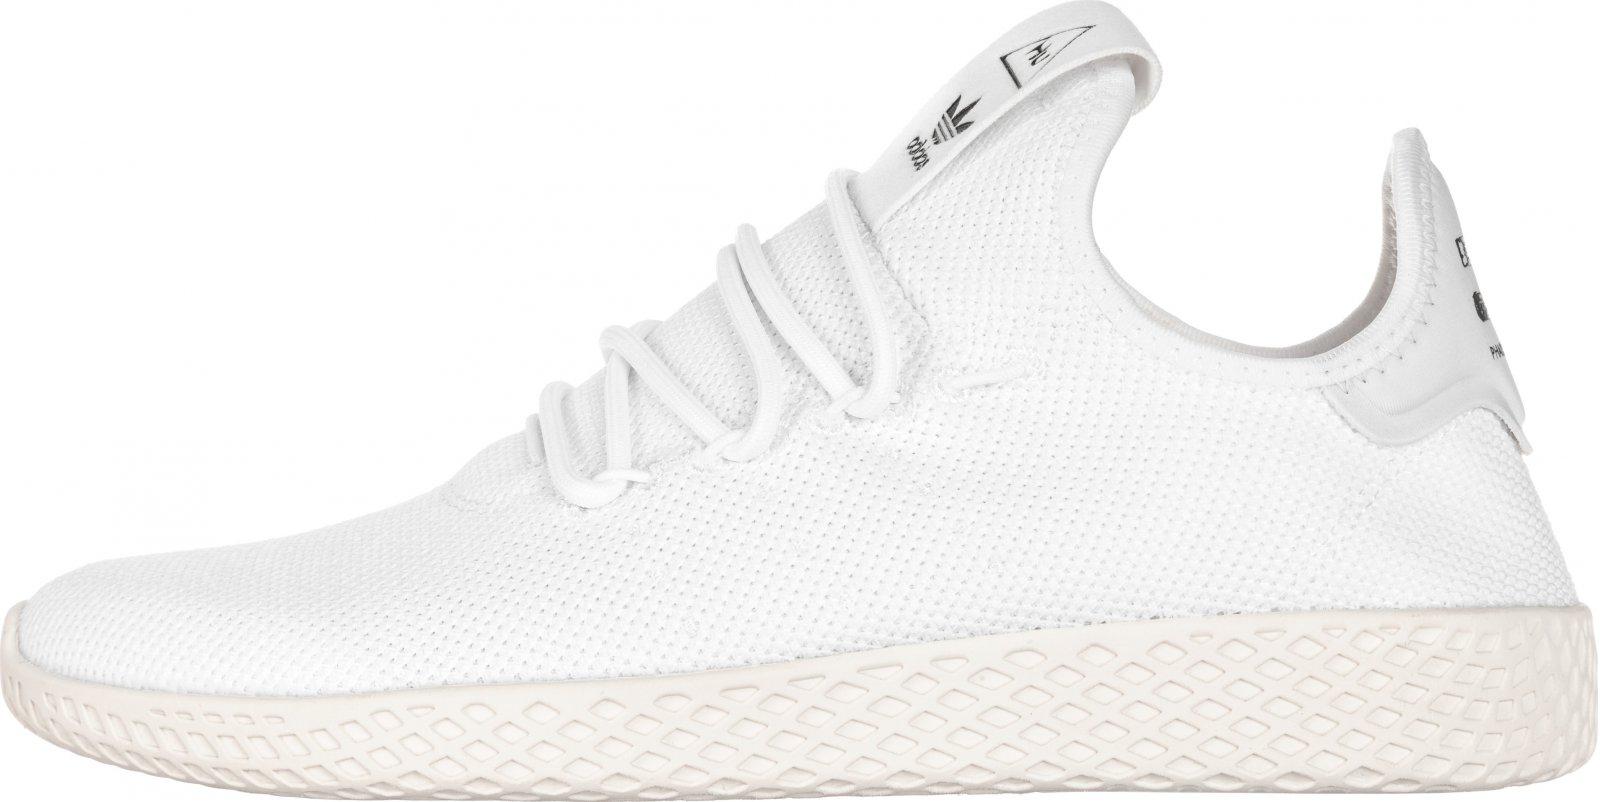 Adidas Pharrell Williams Tennis Hu Ftwr White Chalk White od 1 992 Kč •  Zboží.cz 9afc6d8b4ed